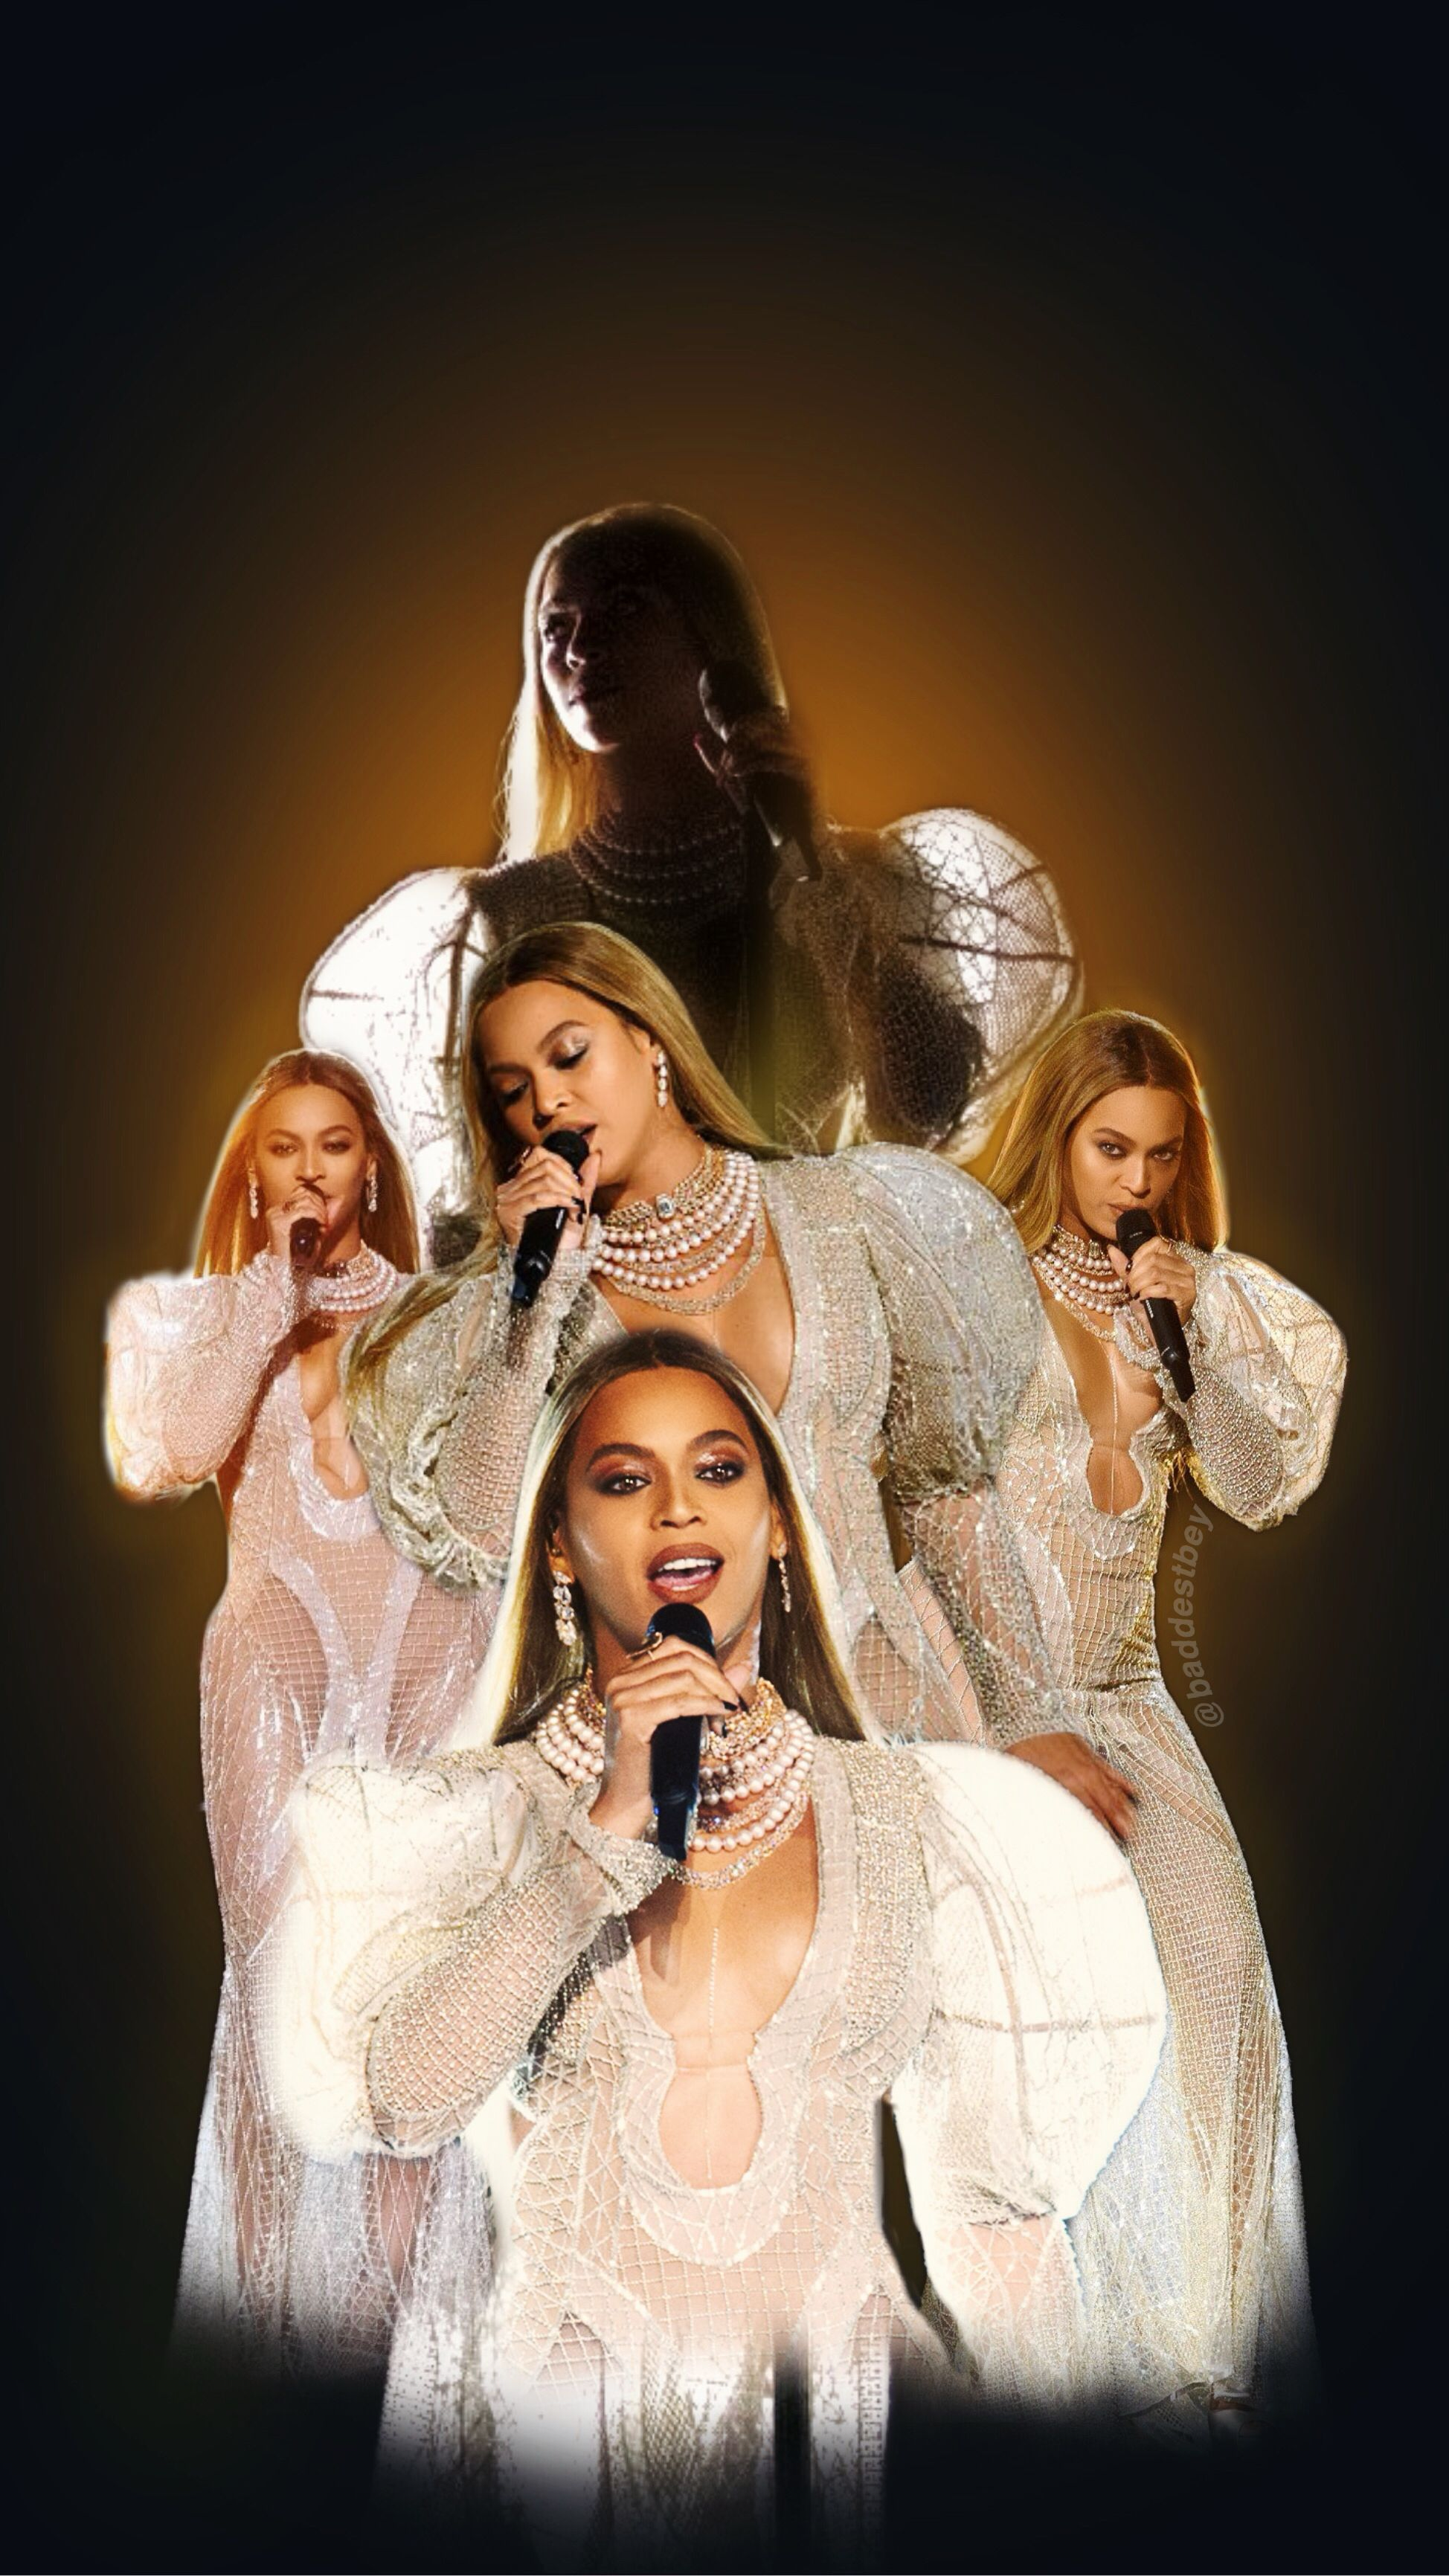 Beyonce Cma Awards Wallpaper Lockscreen Beyonce Wallpaper Beyonce Background Beyonce Beyonce Queen